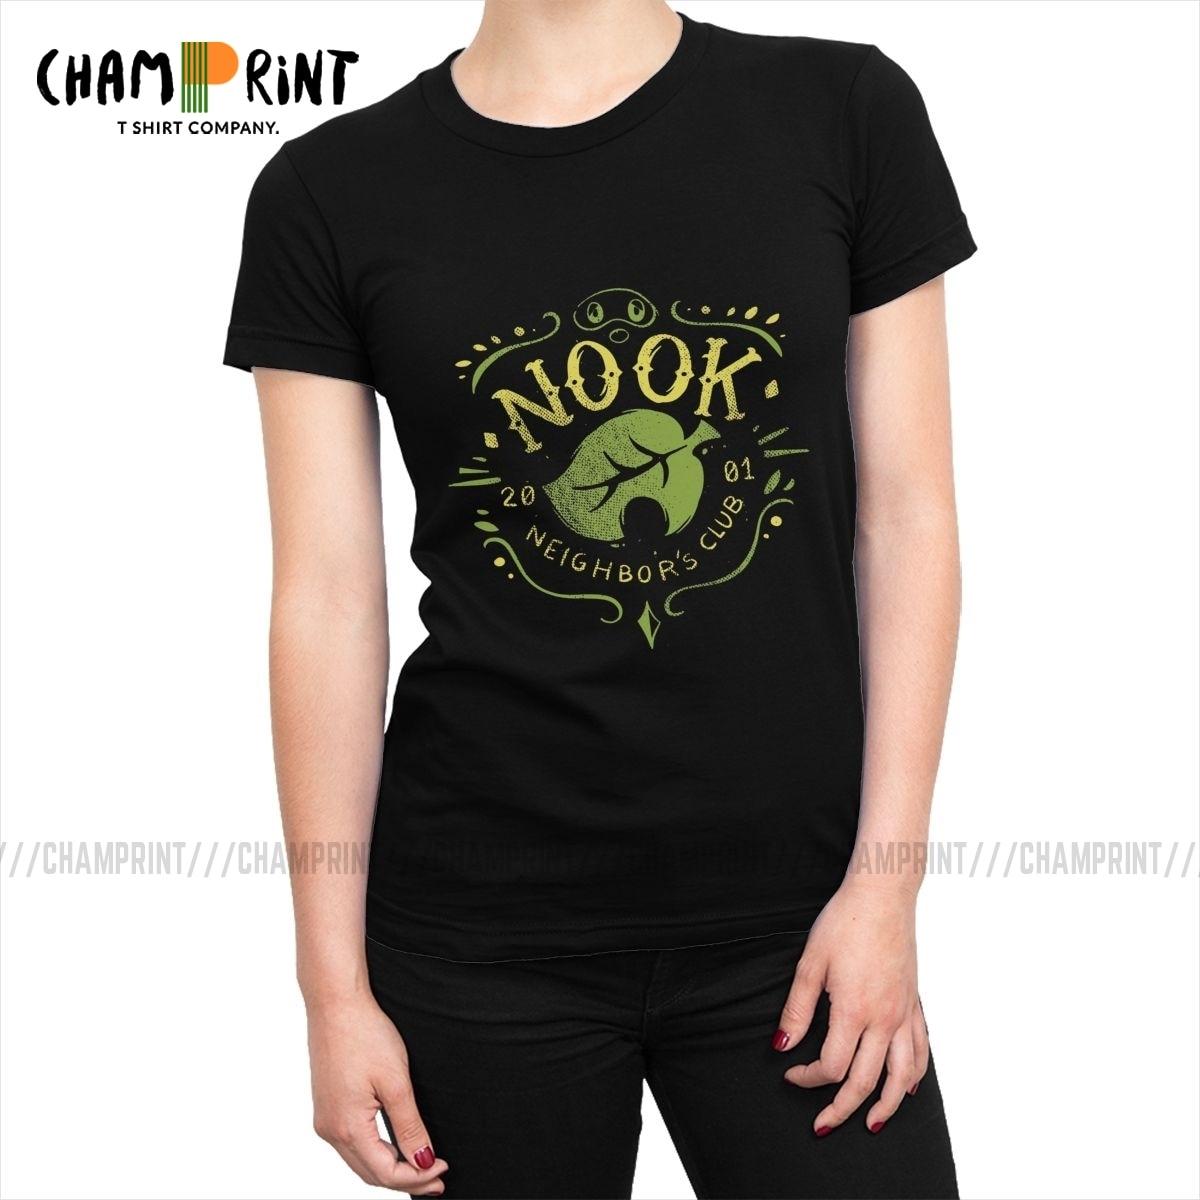 Nook Neighbors Club Mujeres camisetas Animal Crossing videojuegos moda camiseta camisetas con cuello redondo Camiseta divertida ropa femenina